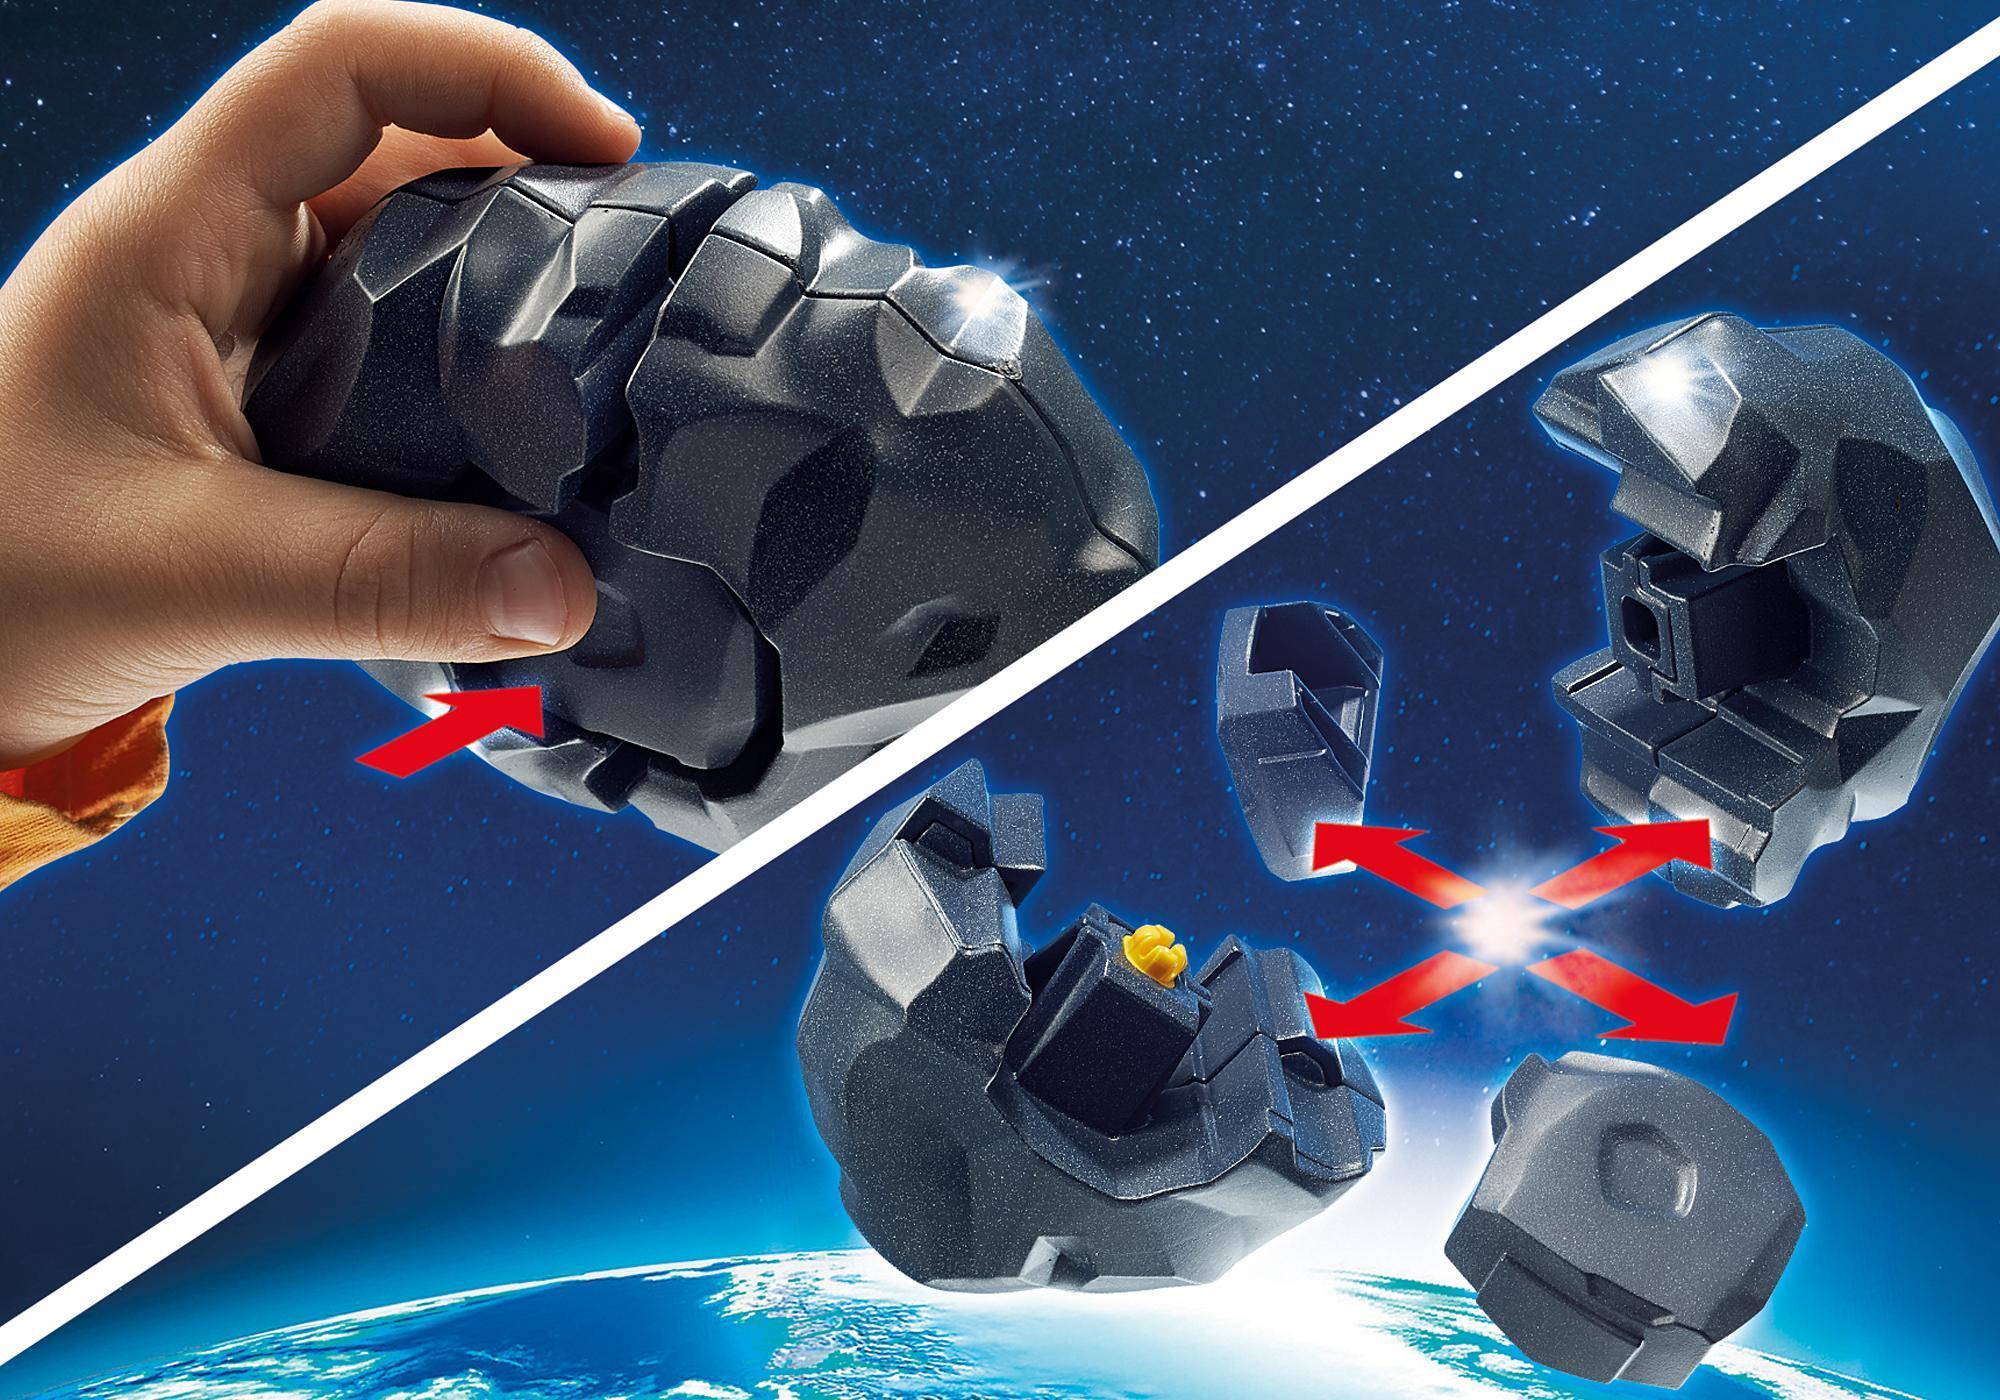 http://media.playmobil.com/i/playmobil/6197_product_extra2/Satélite con Láser para los Meteoritos